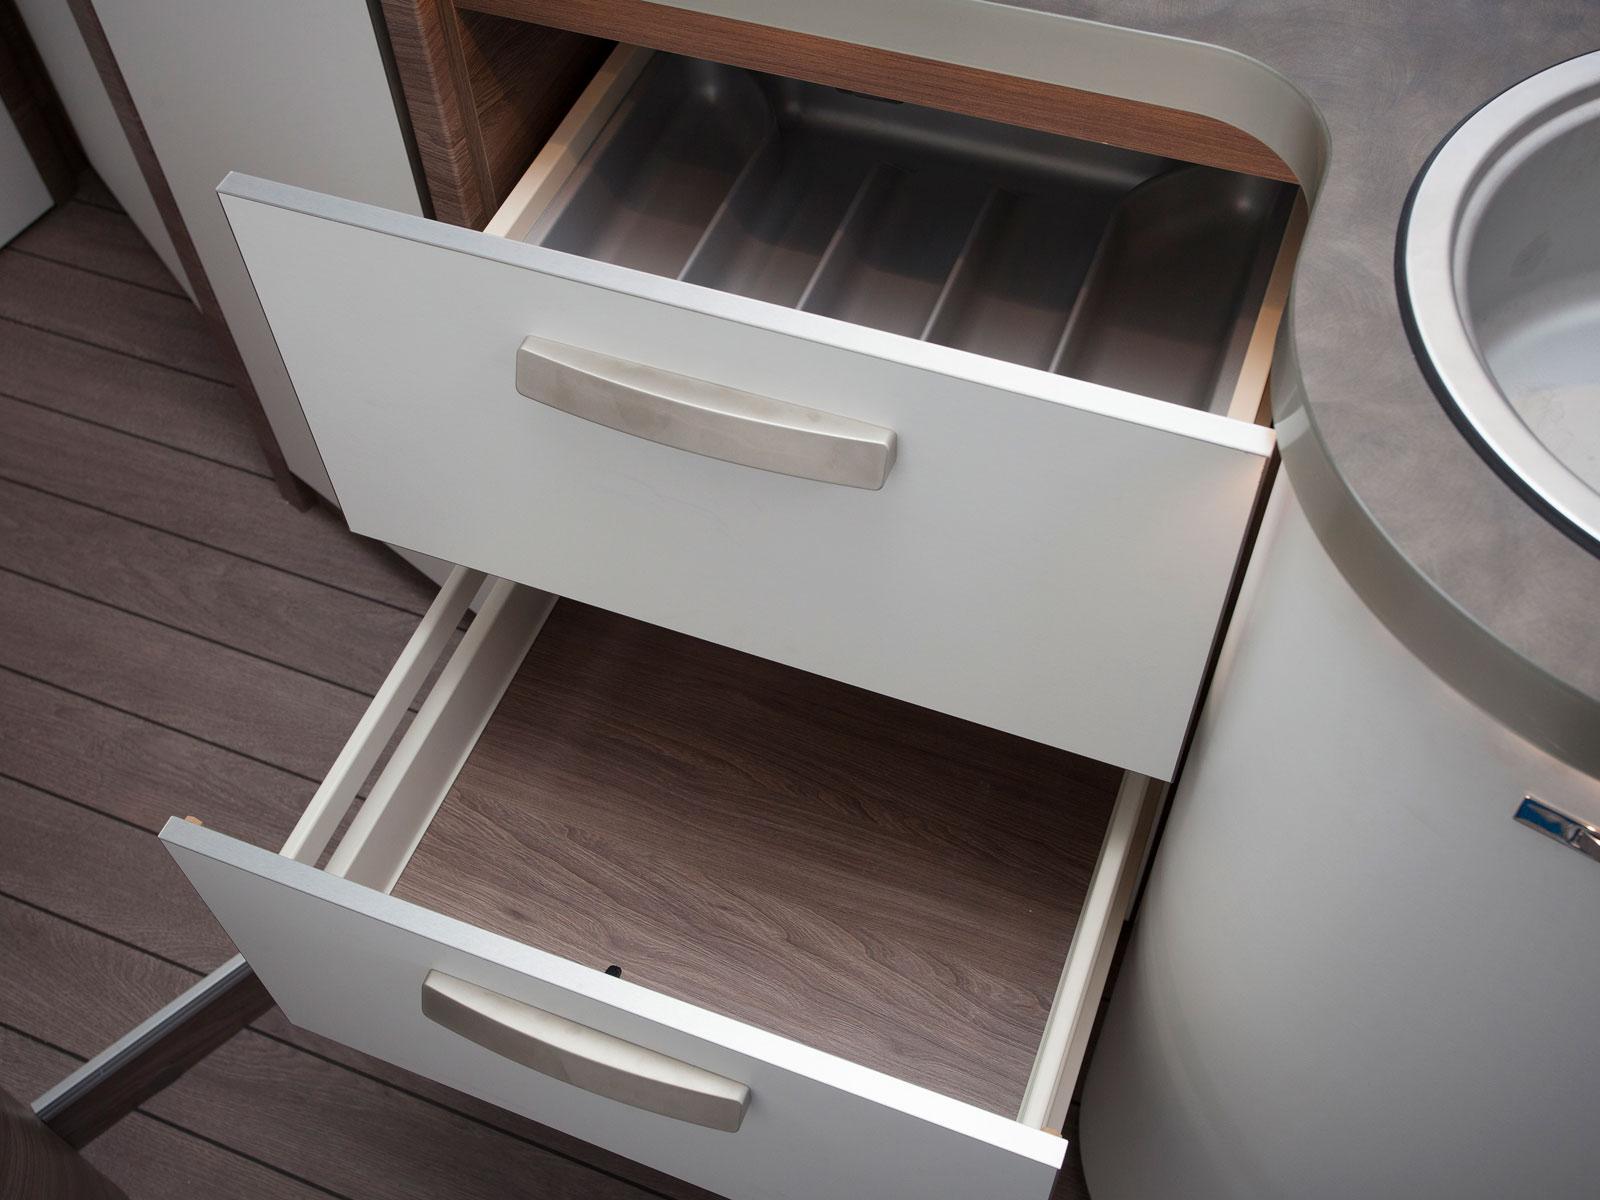 Konventionella kökslådor där den övre har besticklåda.